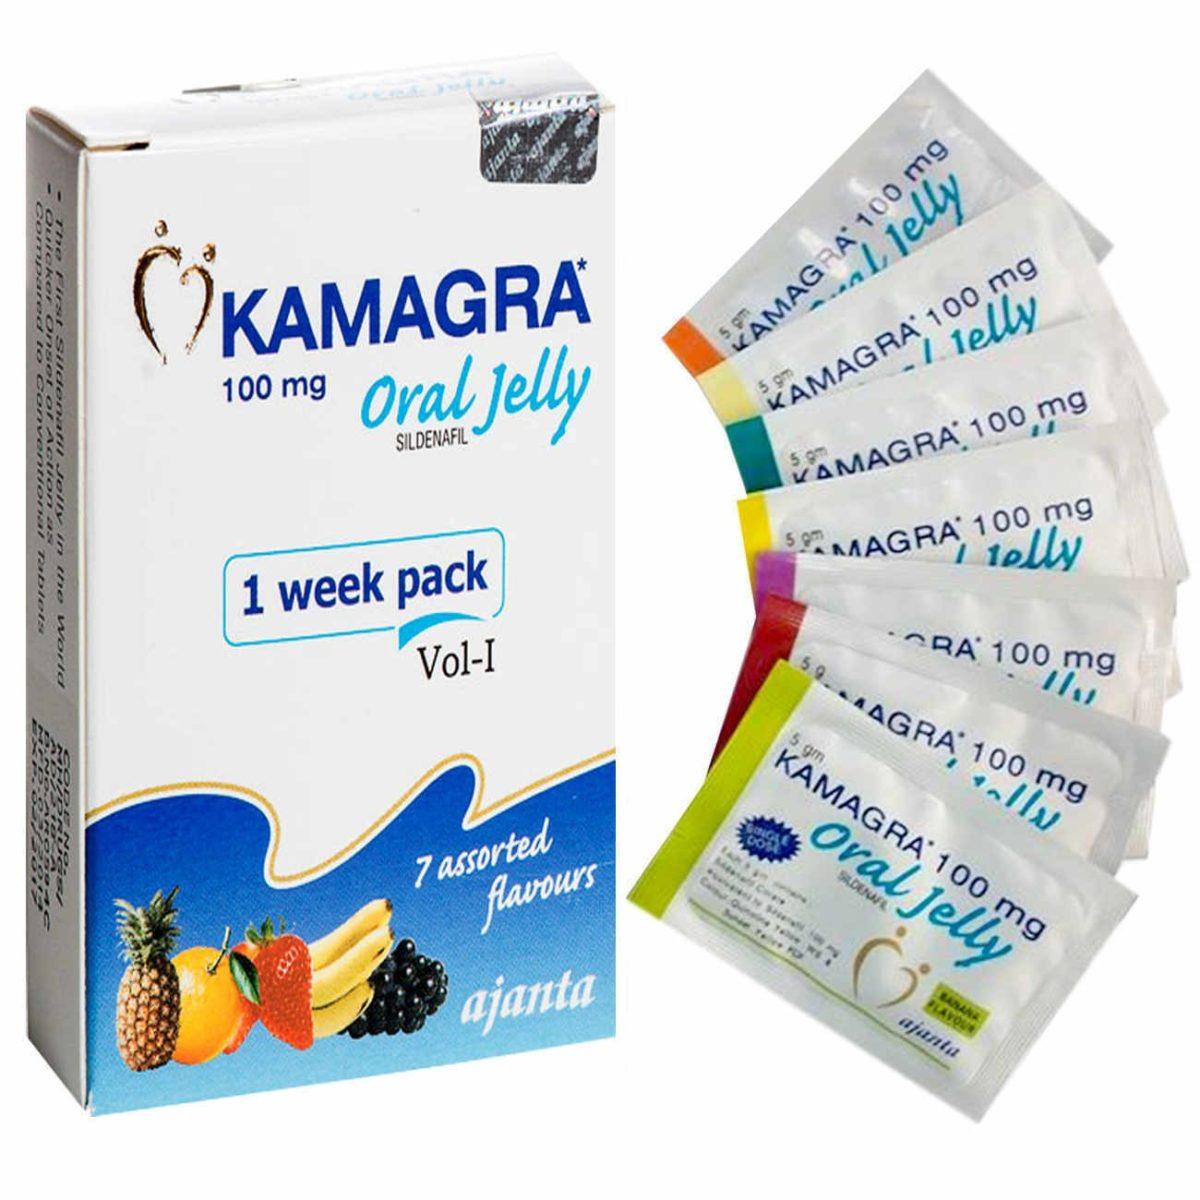 kamagra oral jelly 100mg